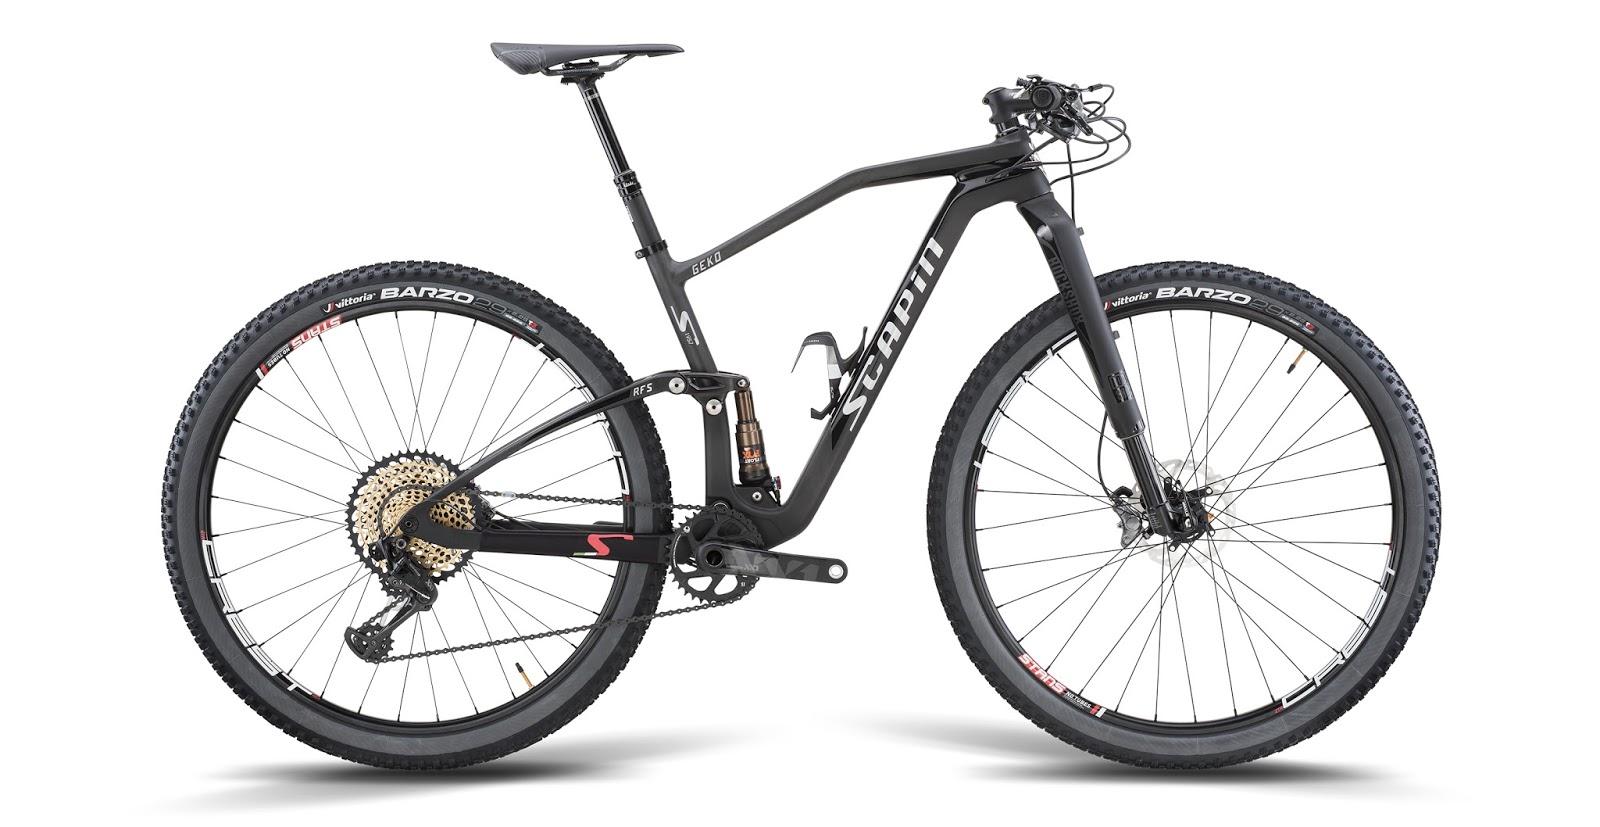 New Geko Mtb Bike From Scapin